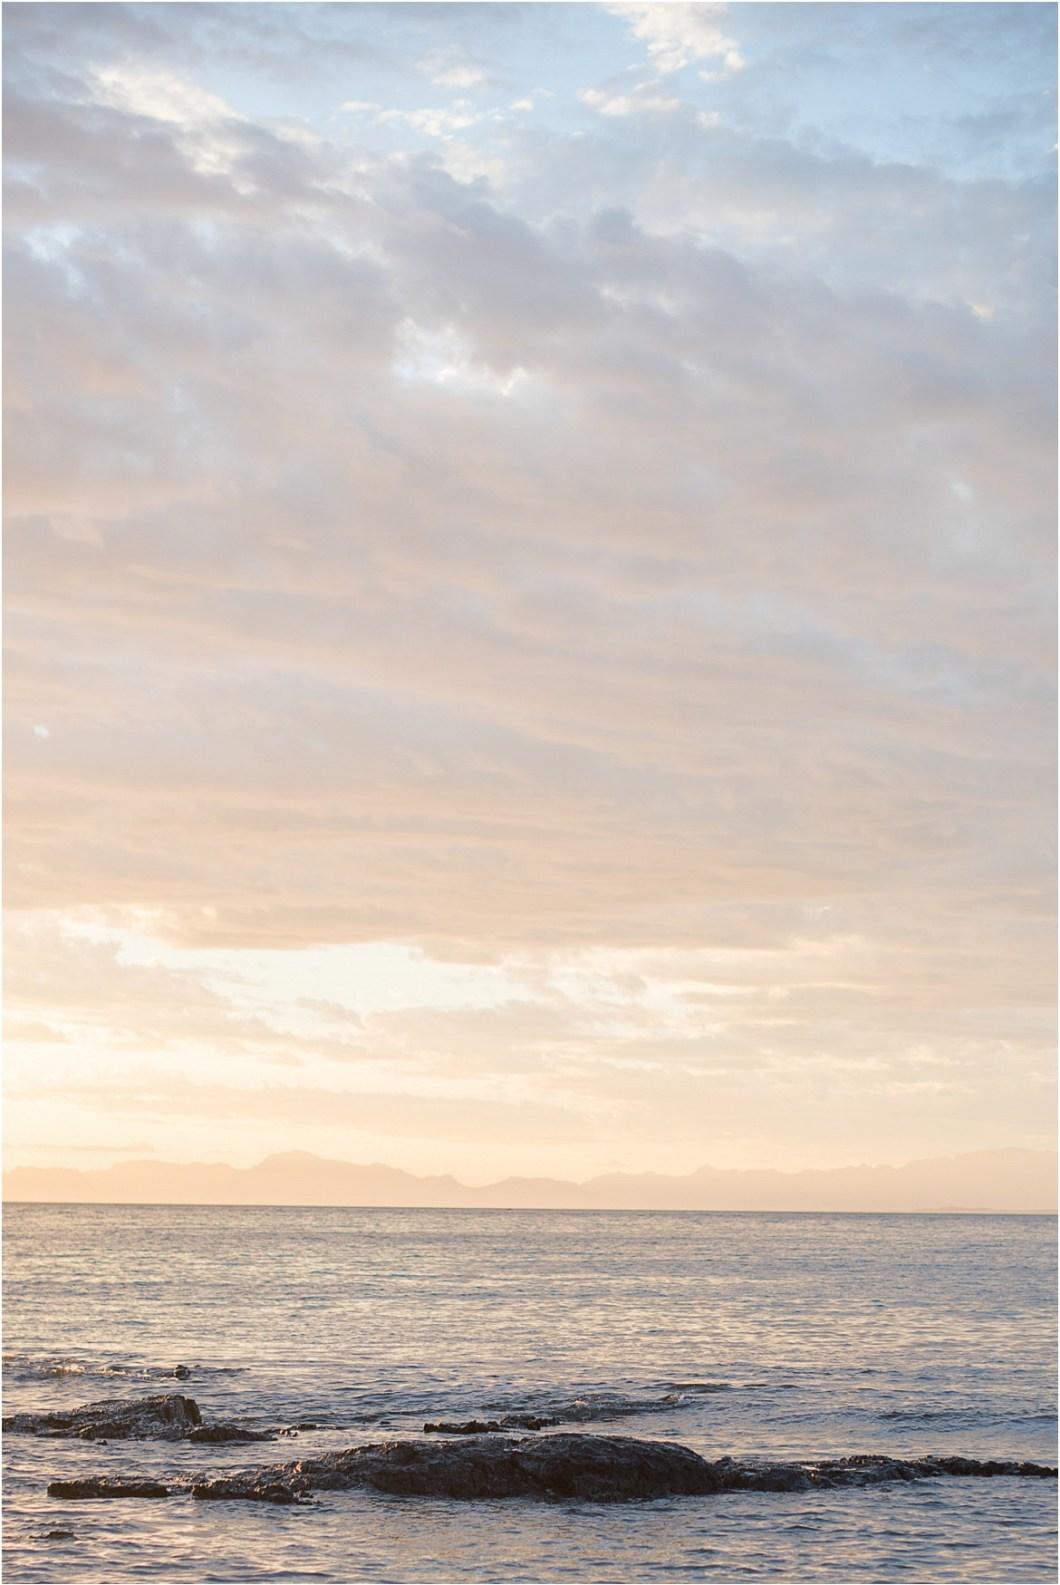 HochzeitsguideFeature-StyledShoot-Schonmich-Beach-020